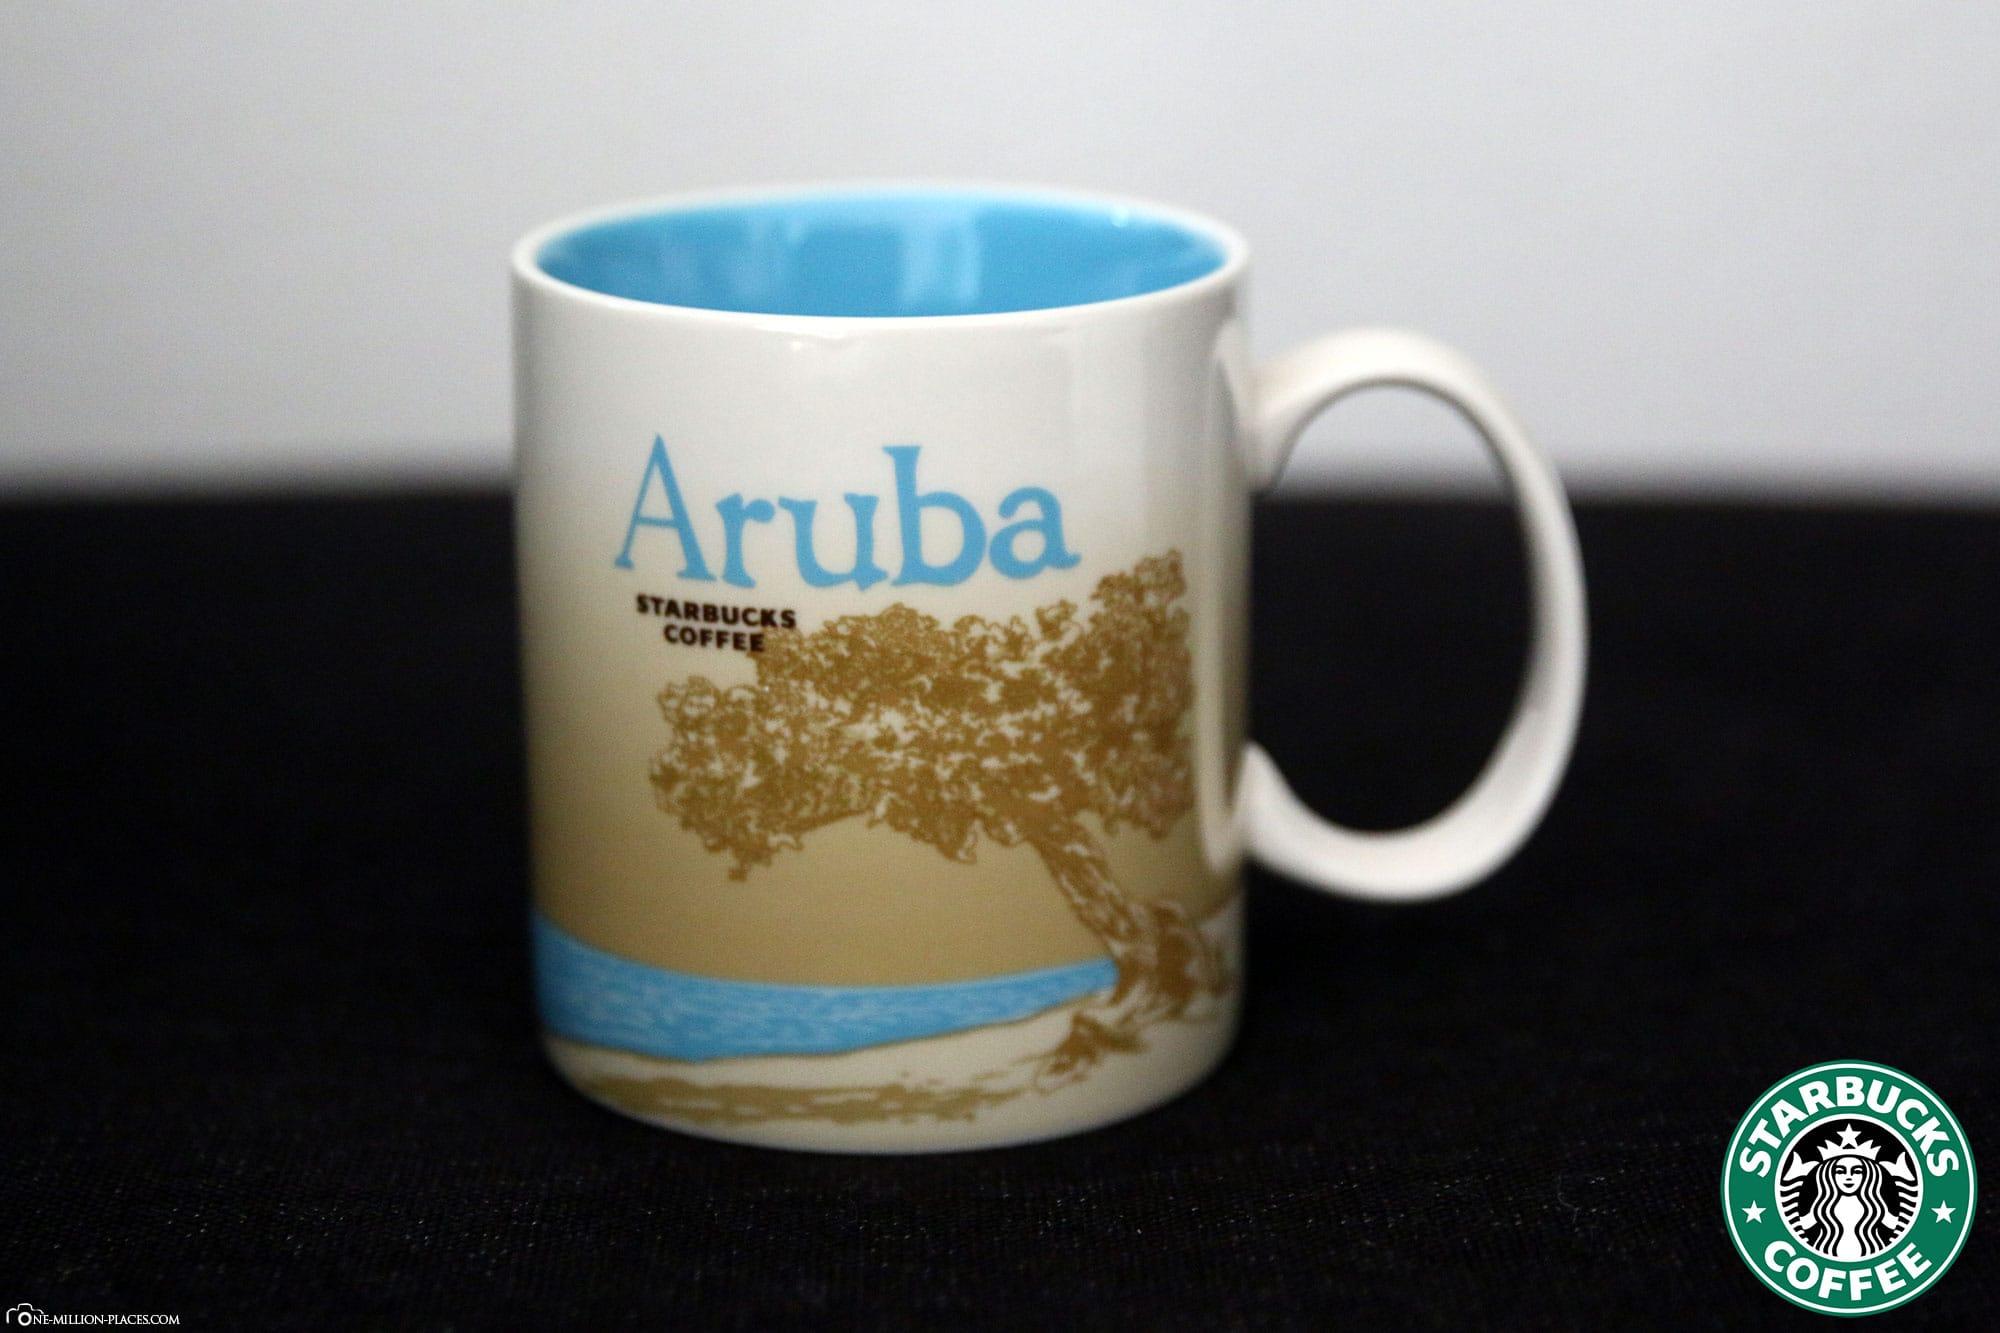 Aruba, Starbucks Cup, Global Icon Series, City Mugs, Collection, ABC Islands, Travelreport